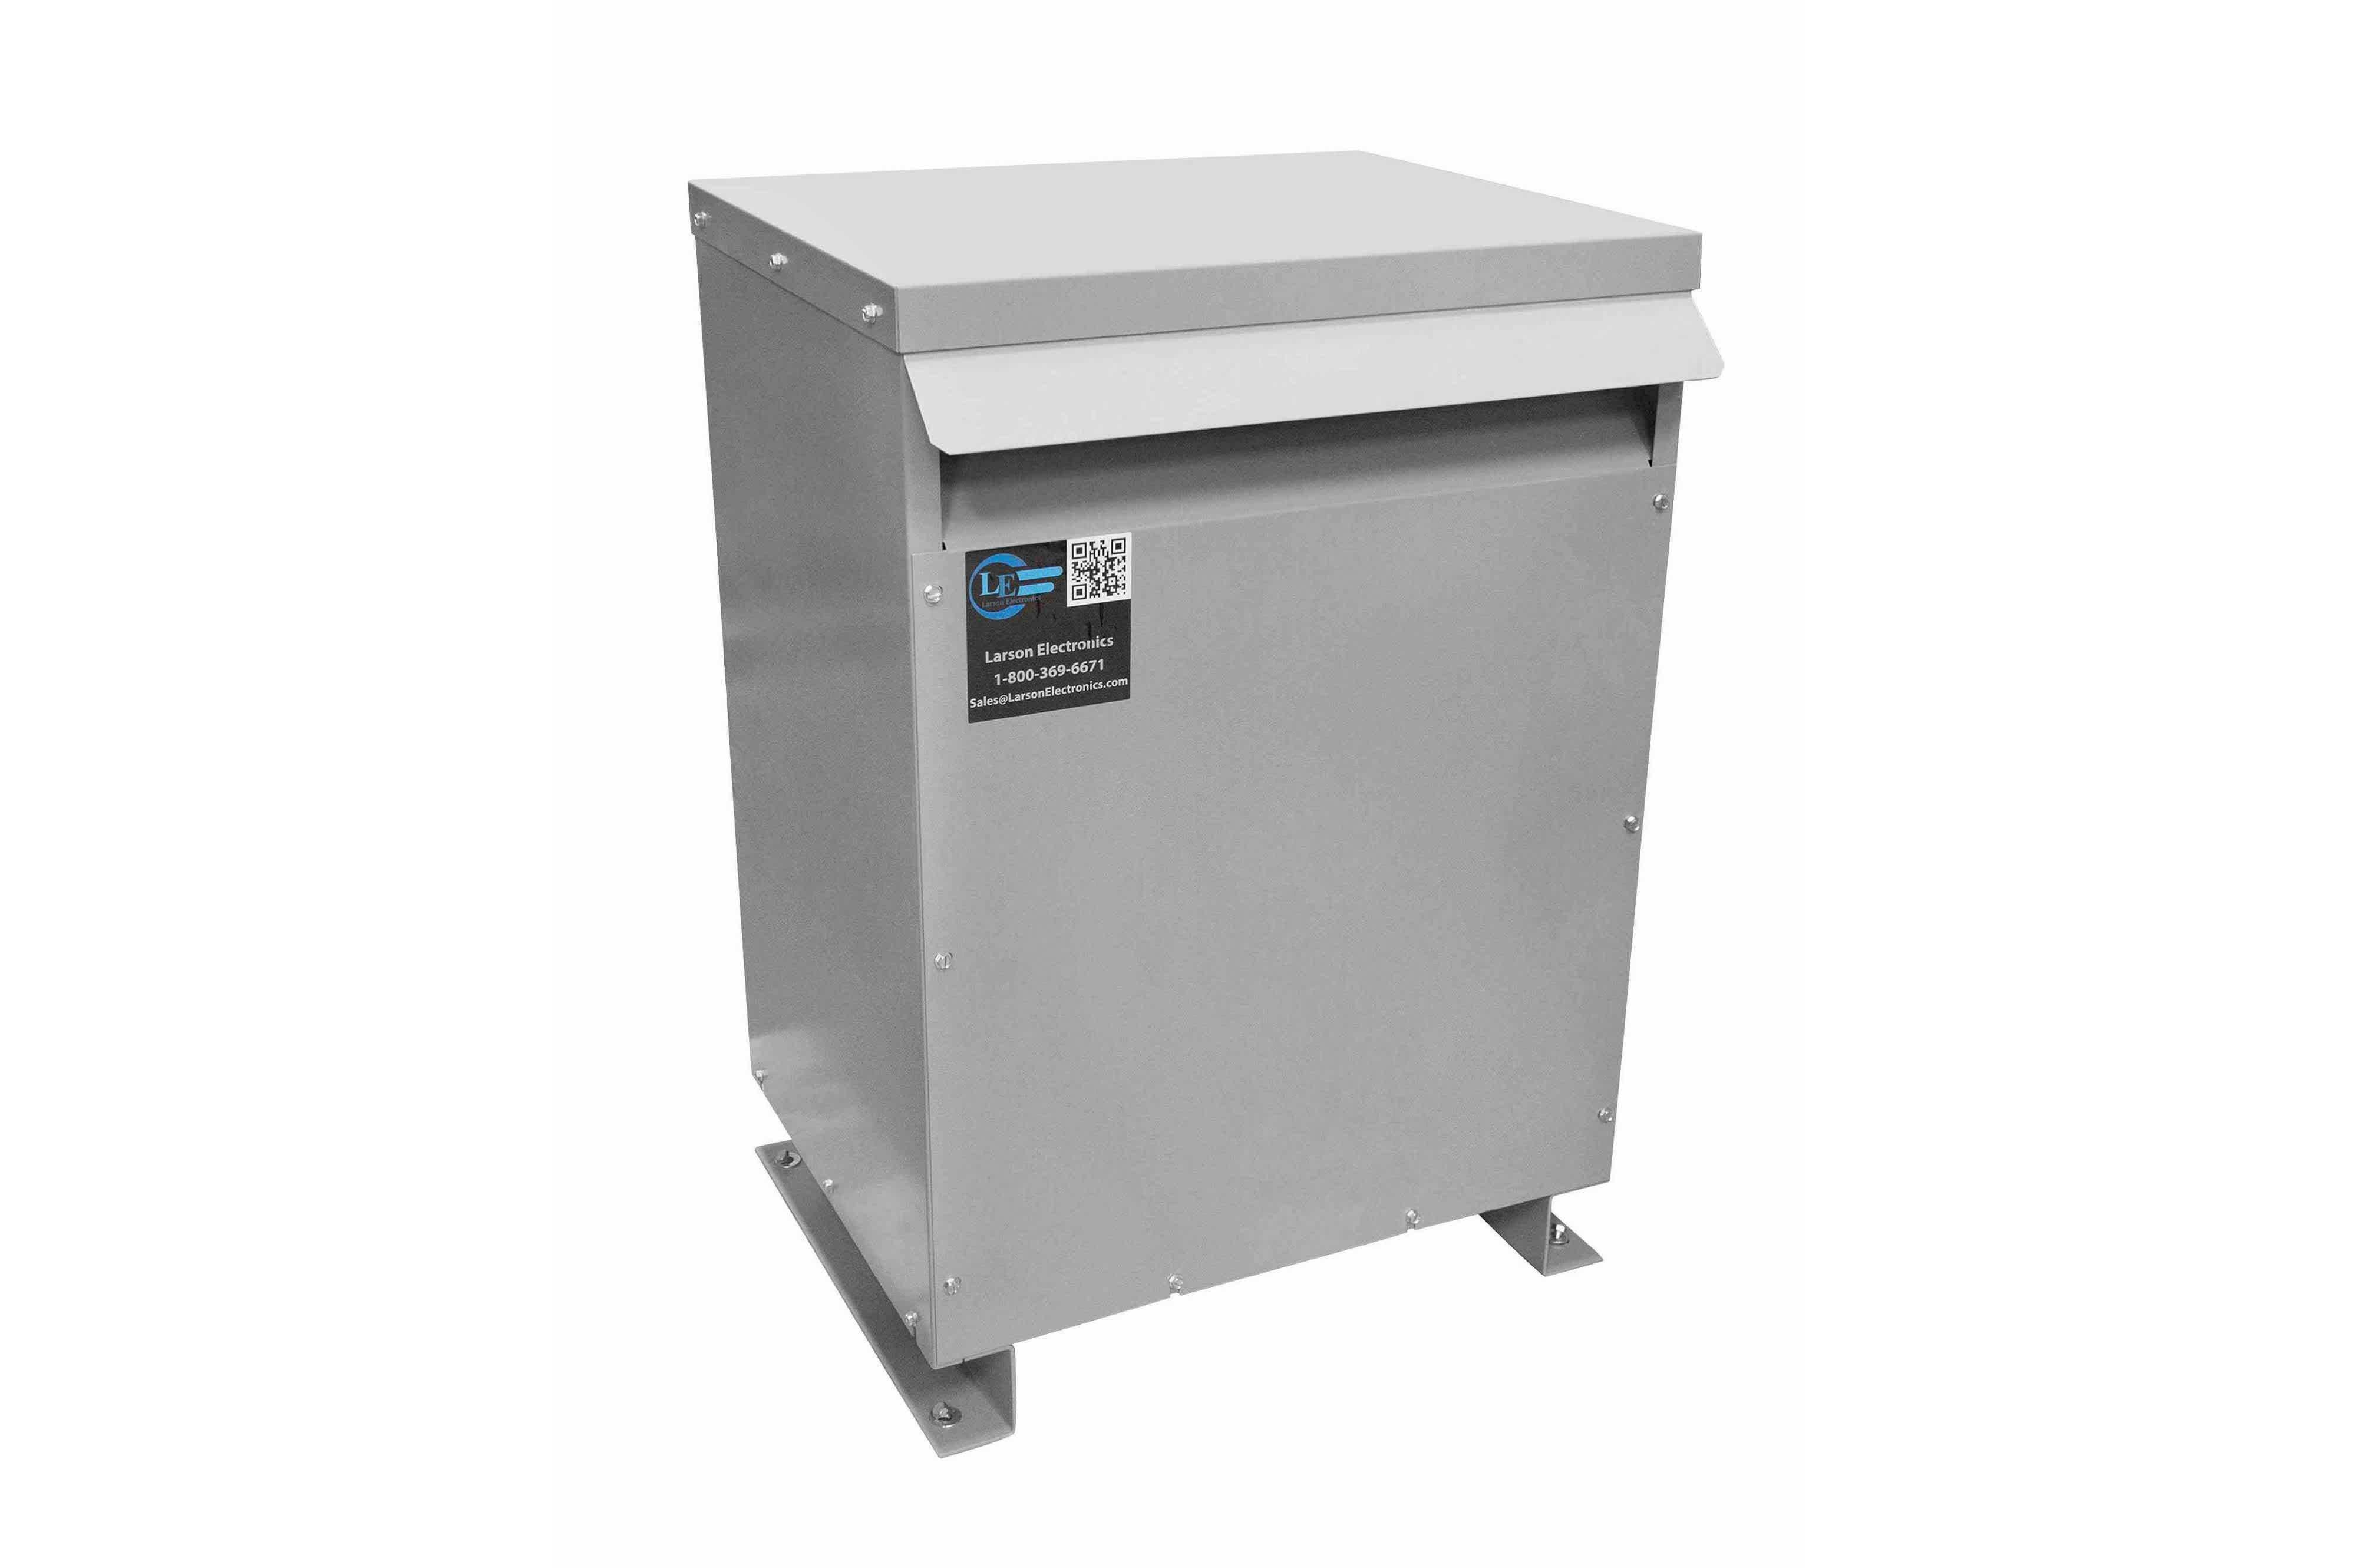 52.5 kVA 3PH Isolation Transformer, 220V Wye Primary, 480V Delta Secondary, N3R, Ventilated, 60 Hz